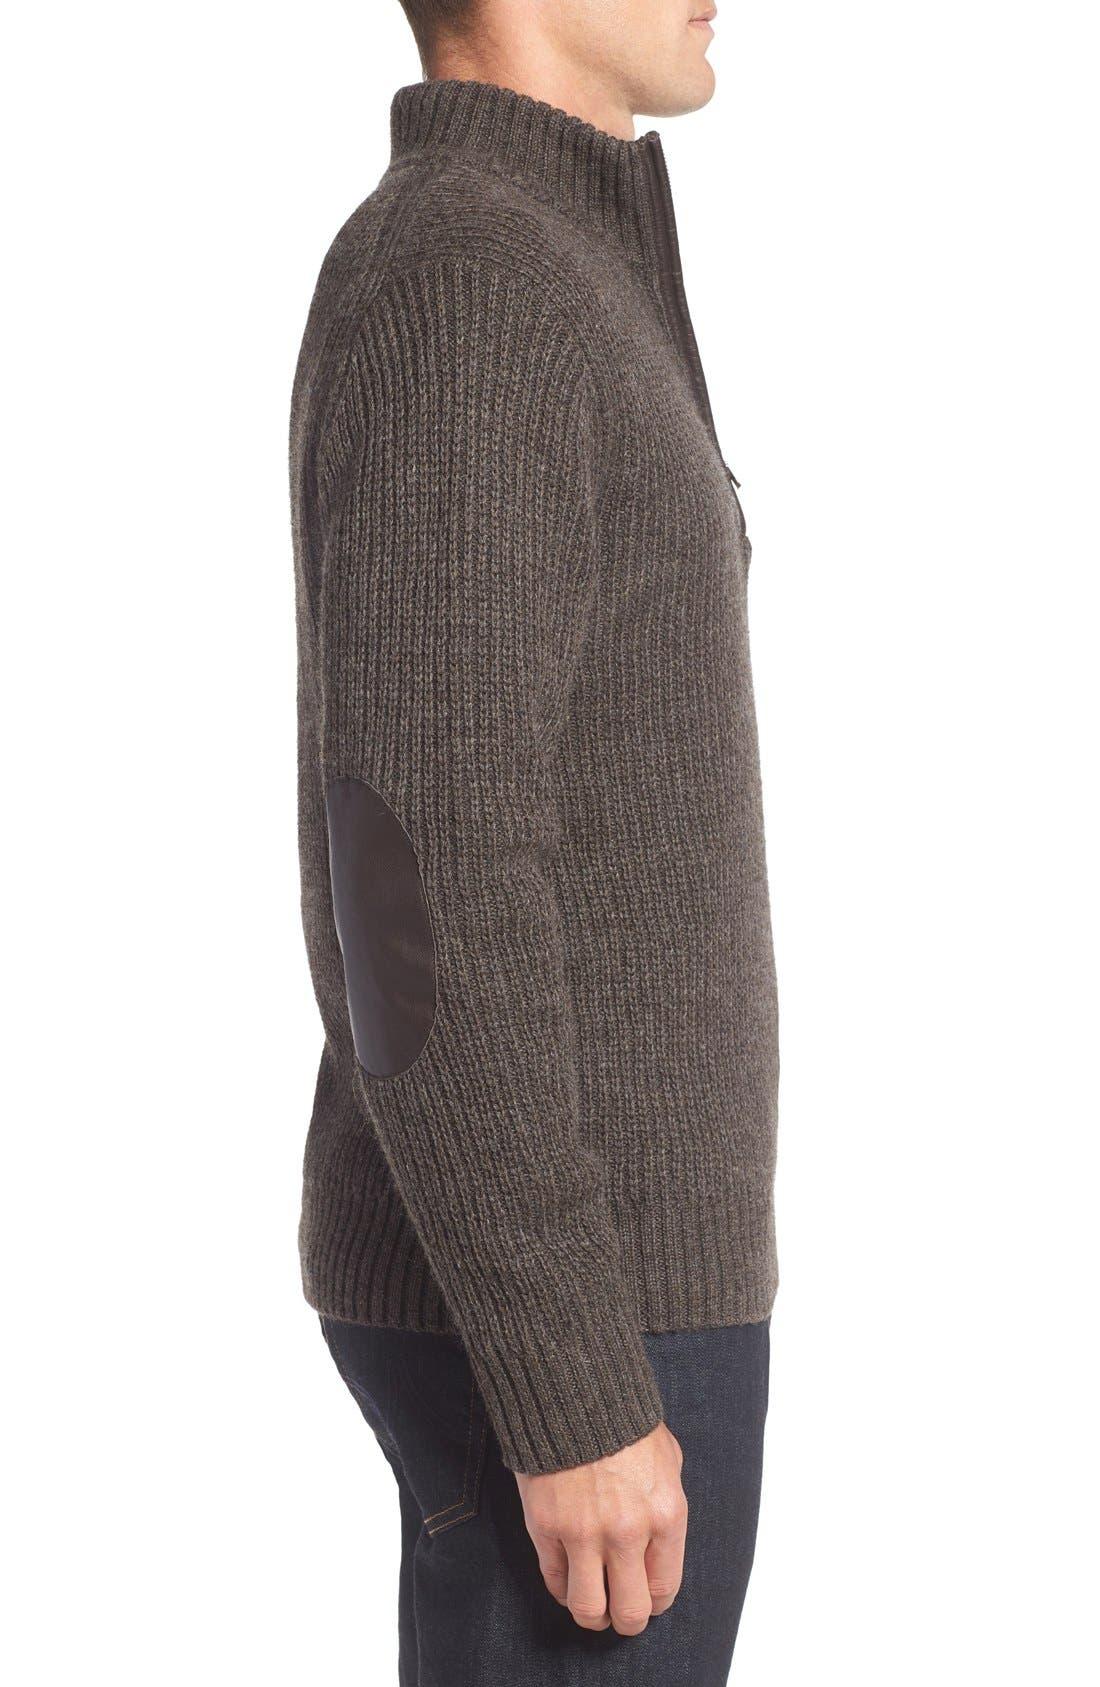 'Huka Lodge' Merino Wool Blend Quarter Zip Sweater,                             Alternate thumbnail 3, color,                             Dirt